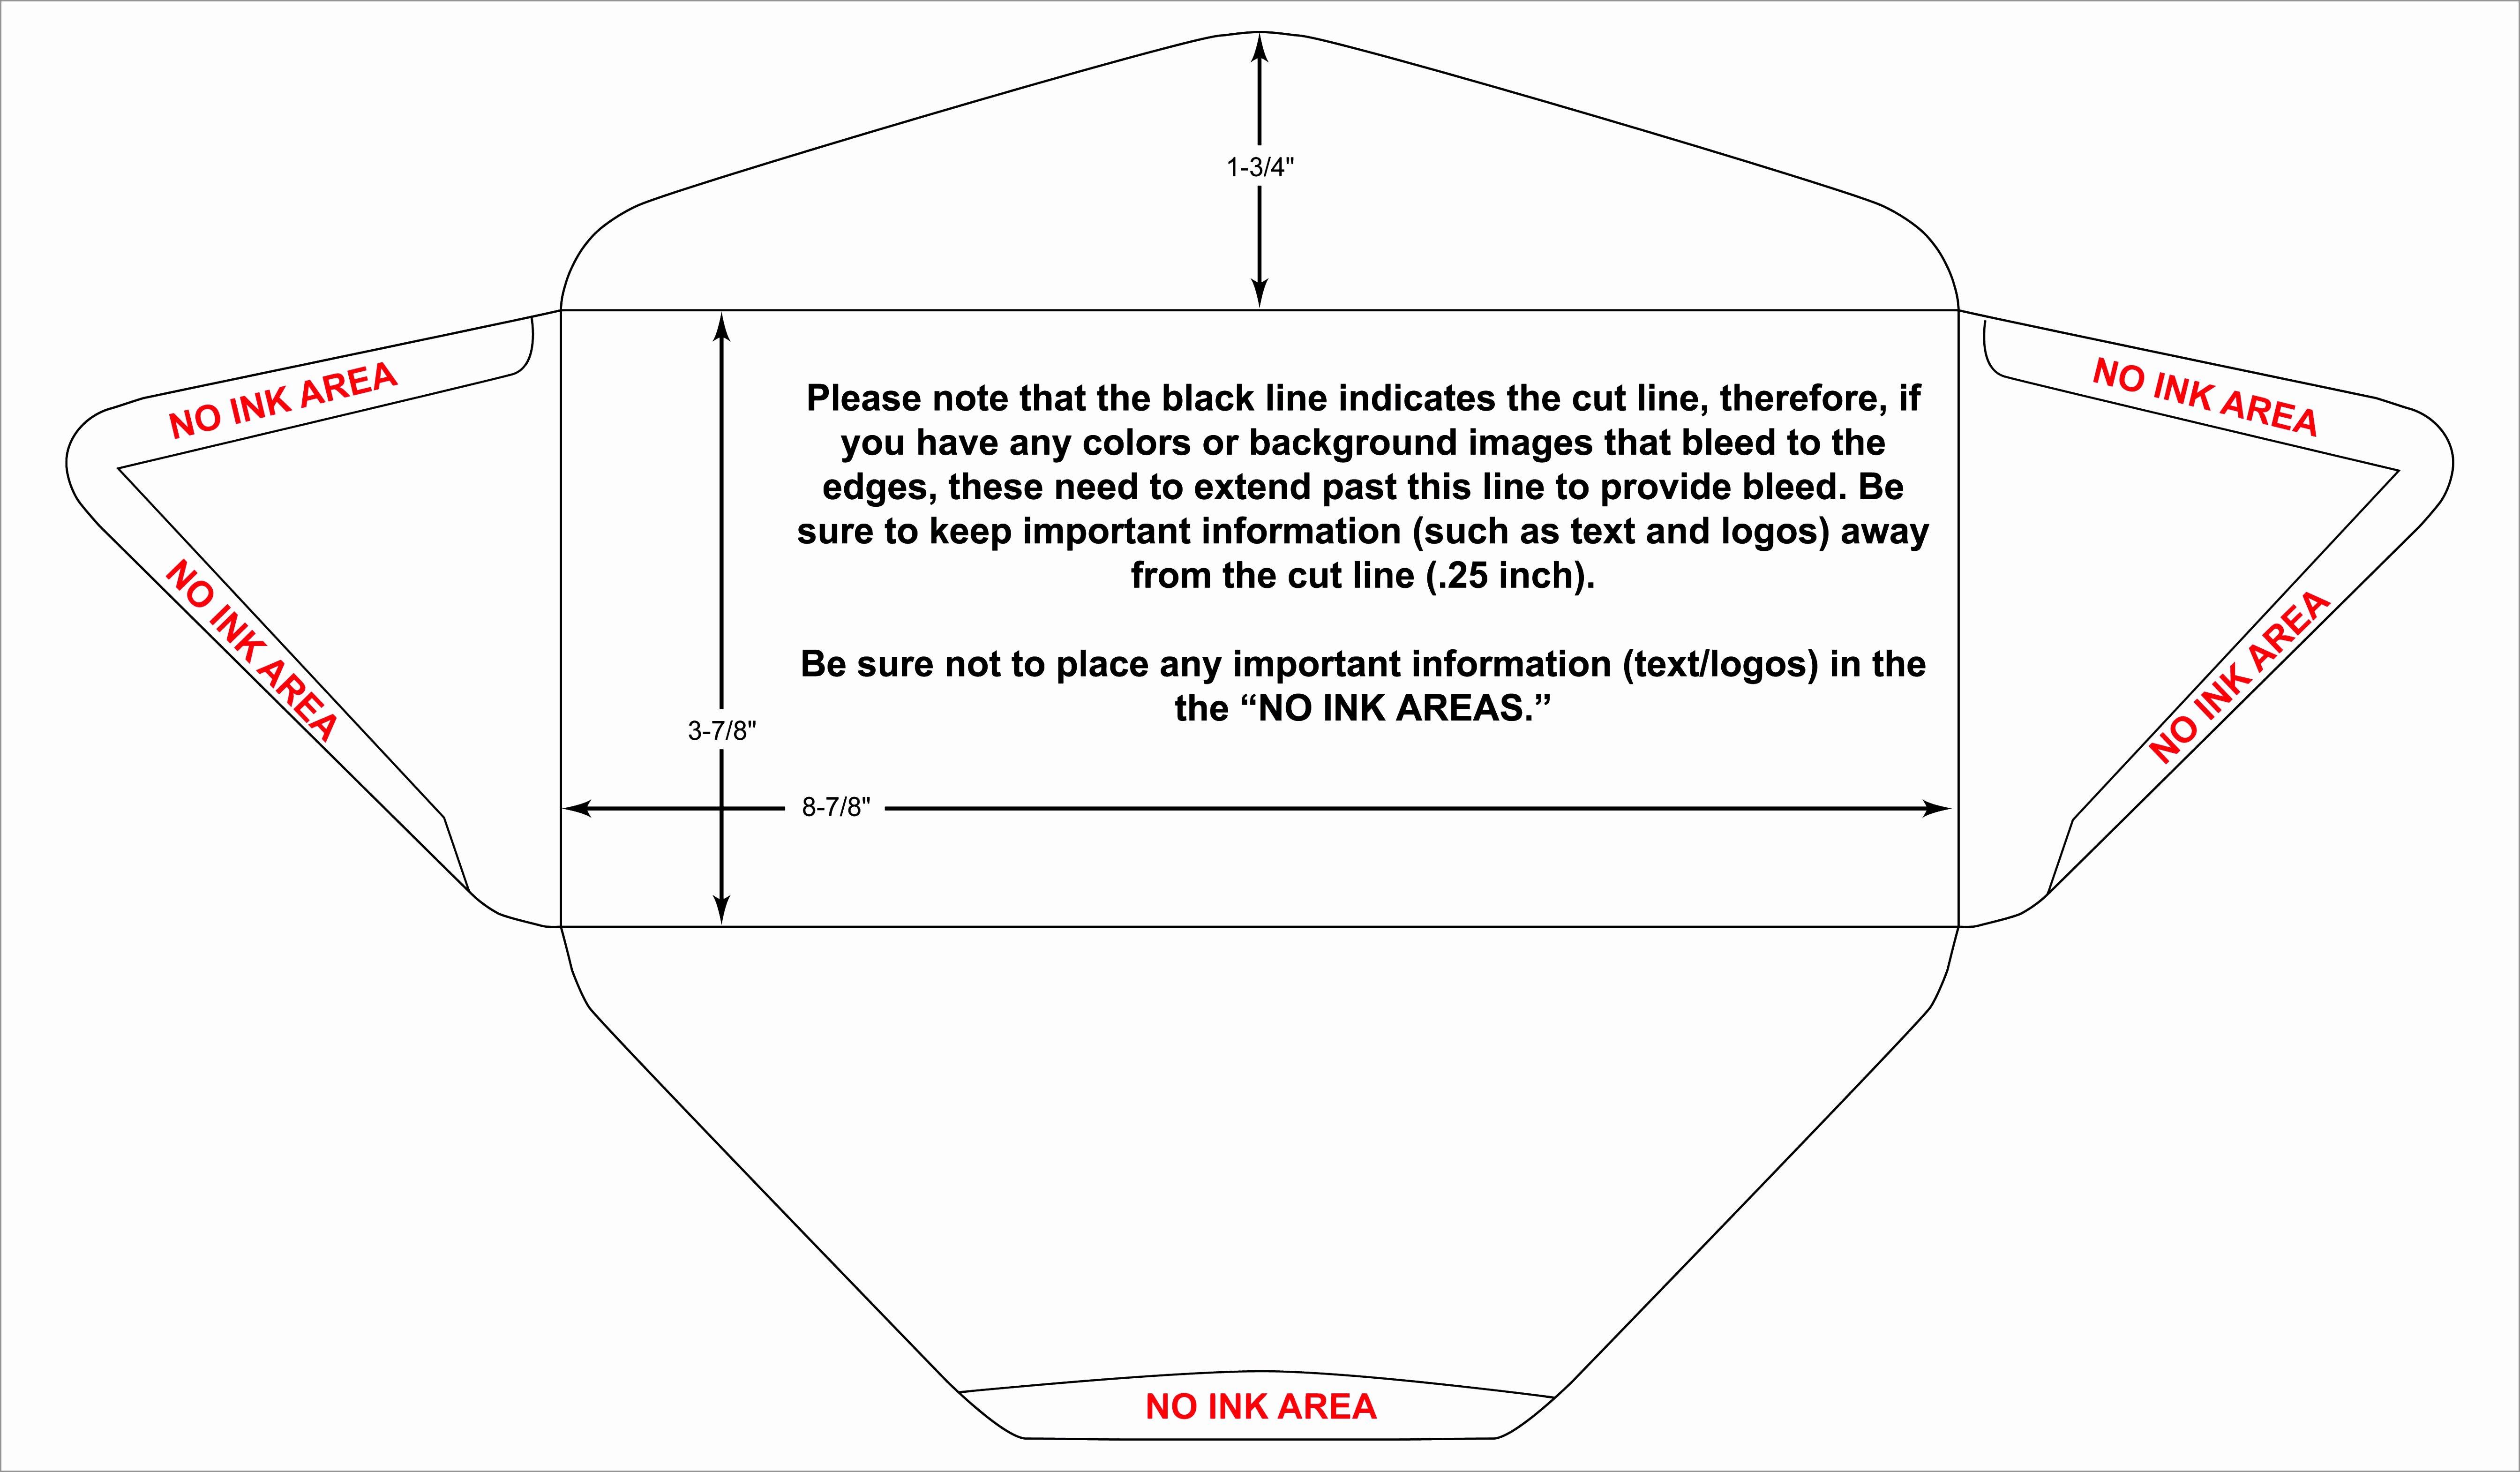 Movie Magic Budgeting Templates Unique Free Envelope Printing Template Simple Free Templates for Envelopes to Print Fresh Pdf Word